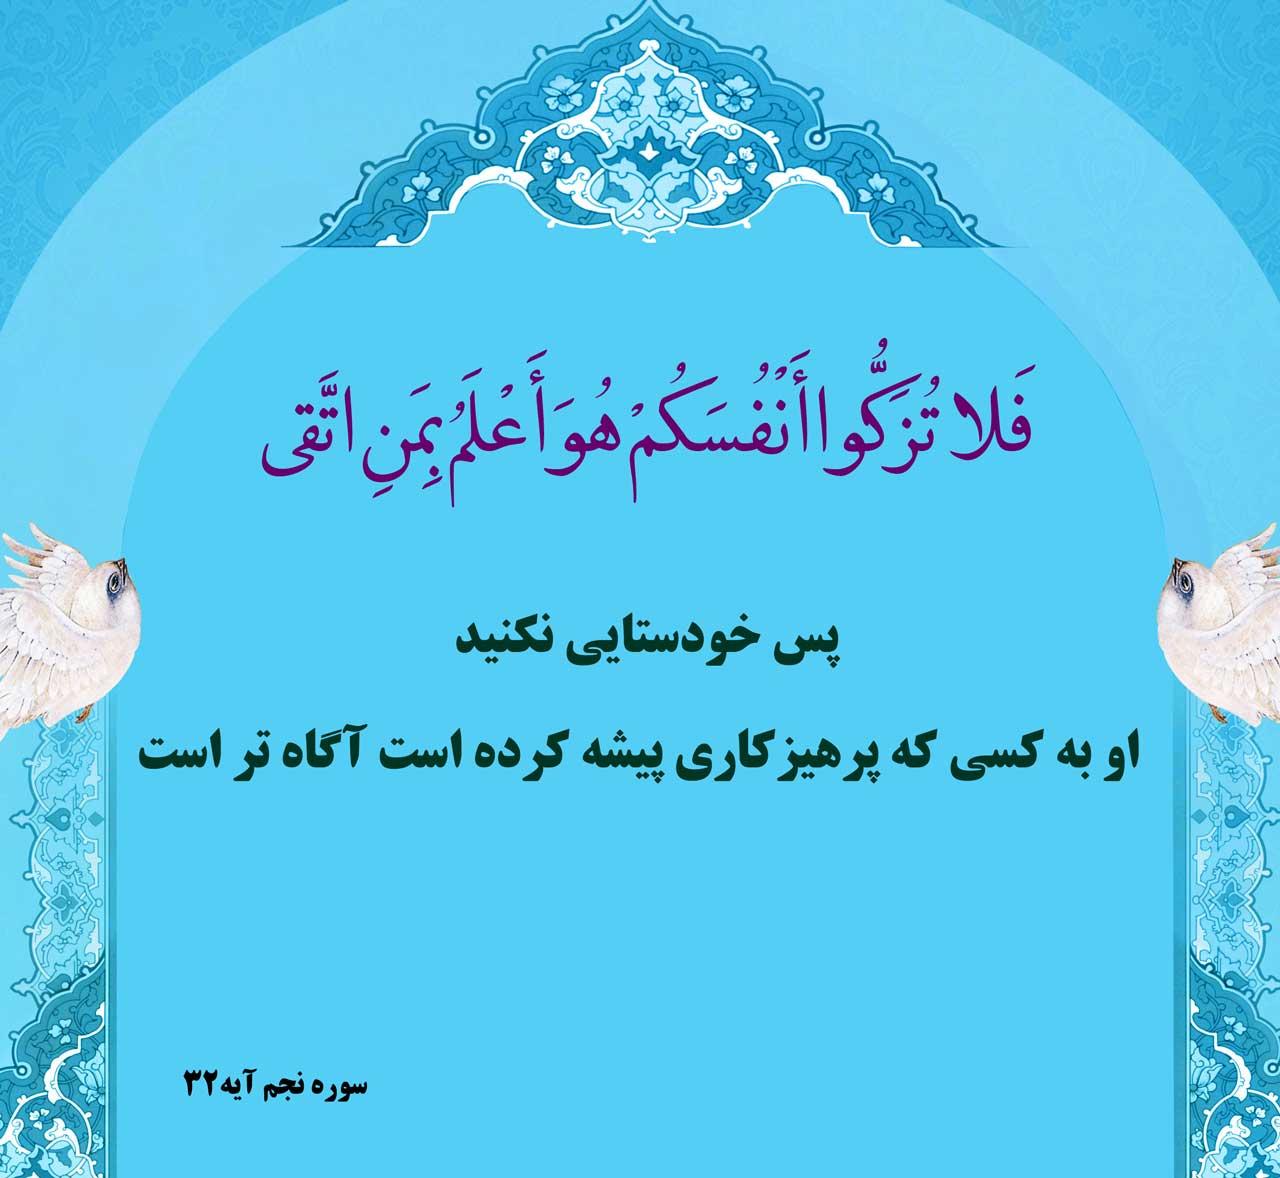 http://www.hawzah.net/Image/telegram/quran95-02-27.jpg